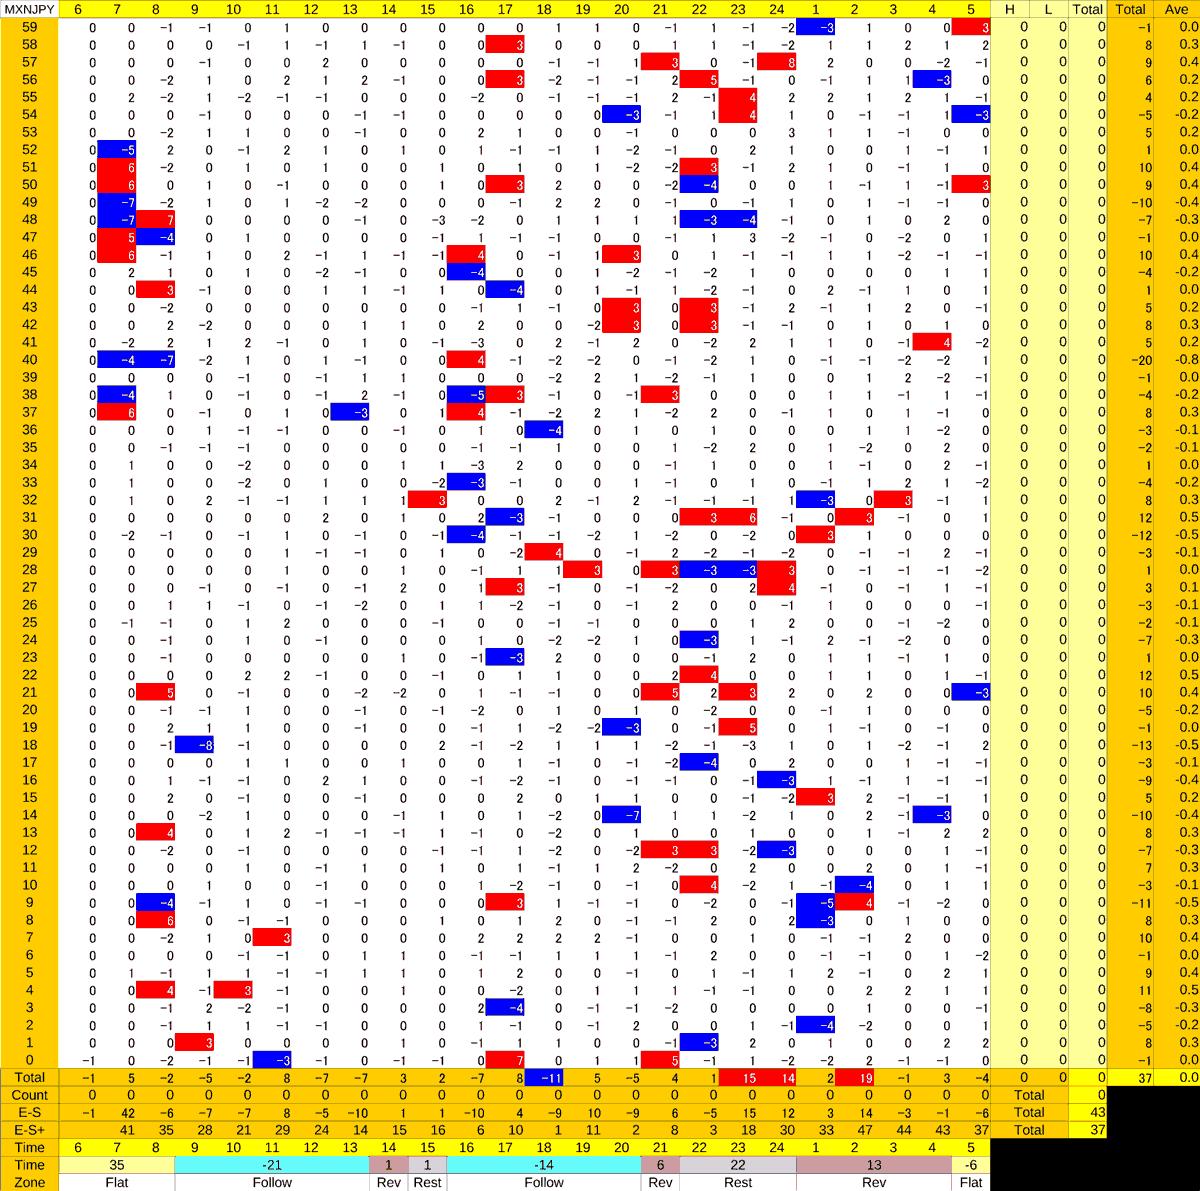 20210111_HS(3)MXNJPY